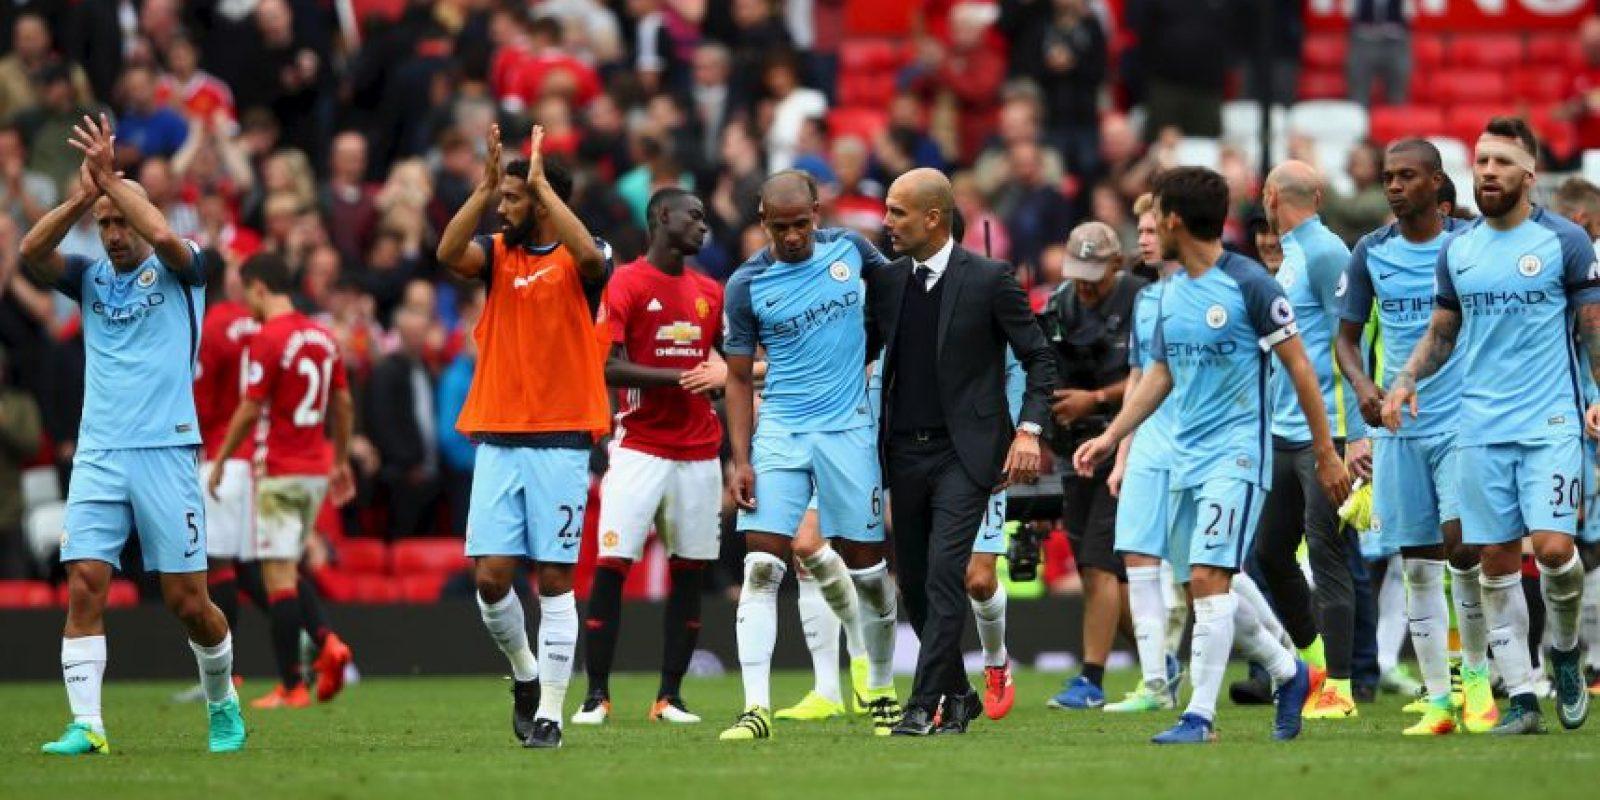 Manchester City y Manchester United se medirán por la Capital One Cup Foto:Getty Images